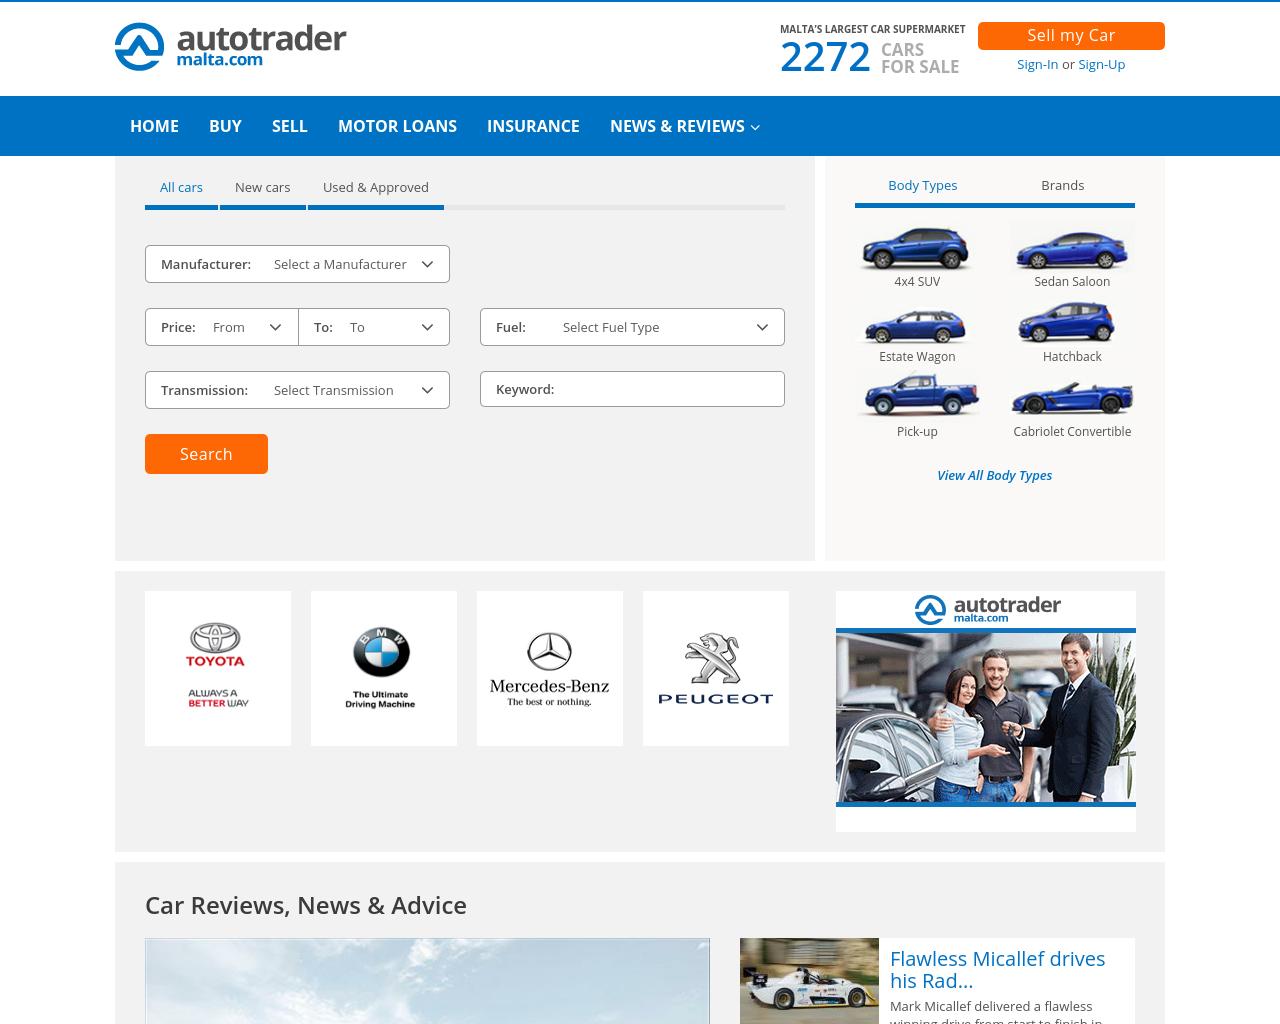 Auto Trader Malta Advertising Mediakits, Reviews, Pricing, Traffic ...